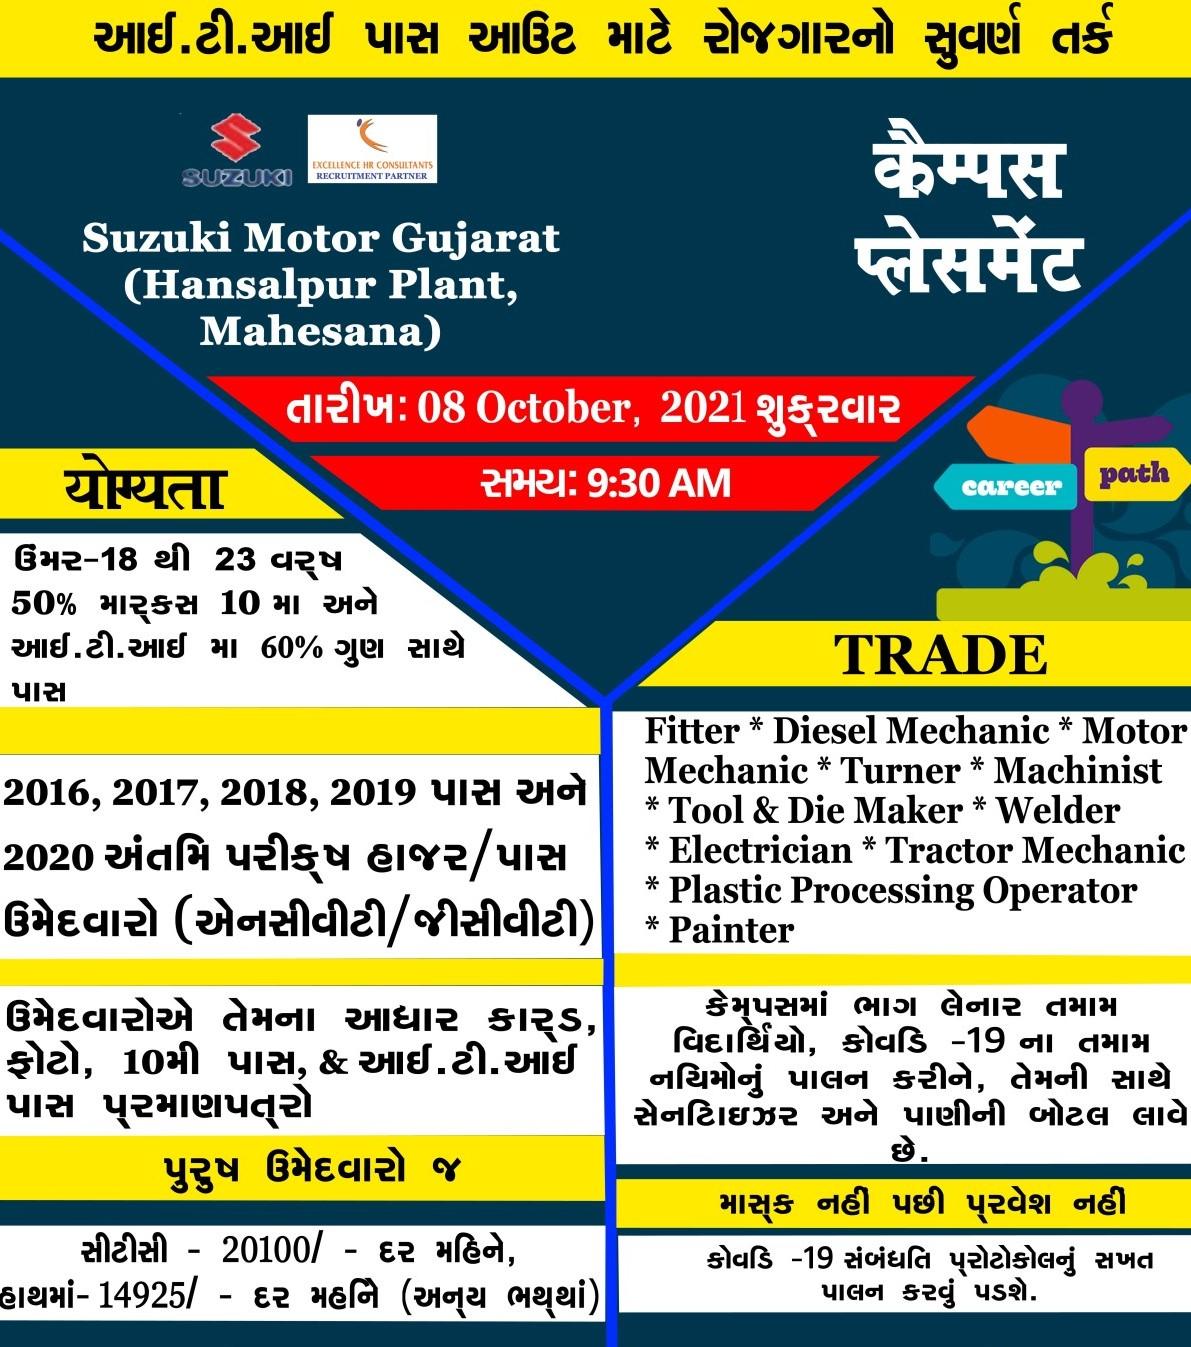 Suzuki Motors Cars Manufacturing Plant Recruitment ITI Campus Drive at Govt ITI Vadnagar, Mahesana, Gujarat